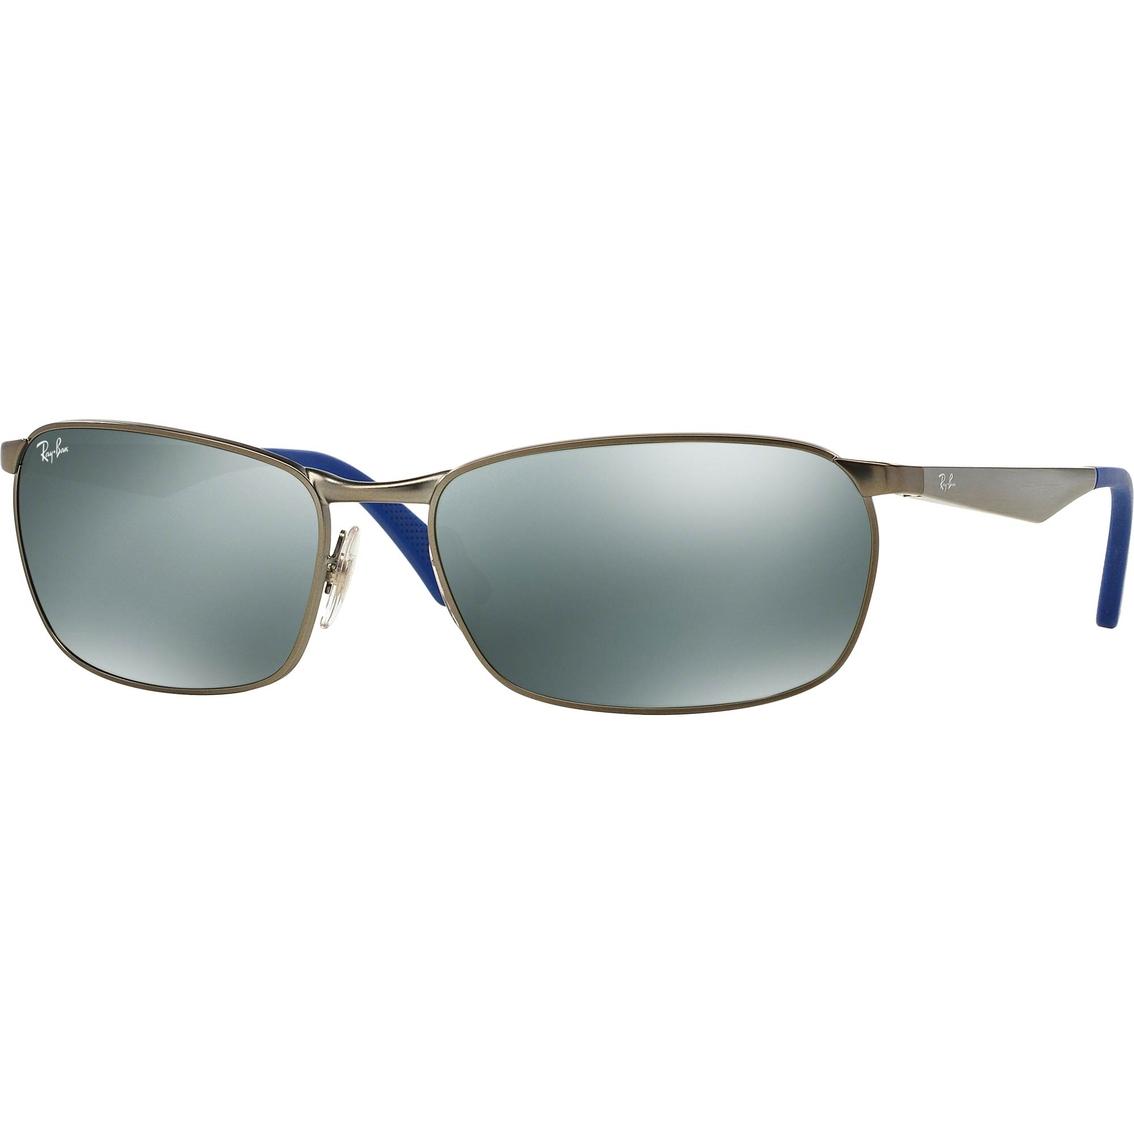 ray ban sunglasses exchange  ray ban rectangular sunglasses 0rb3534